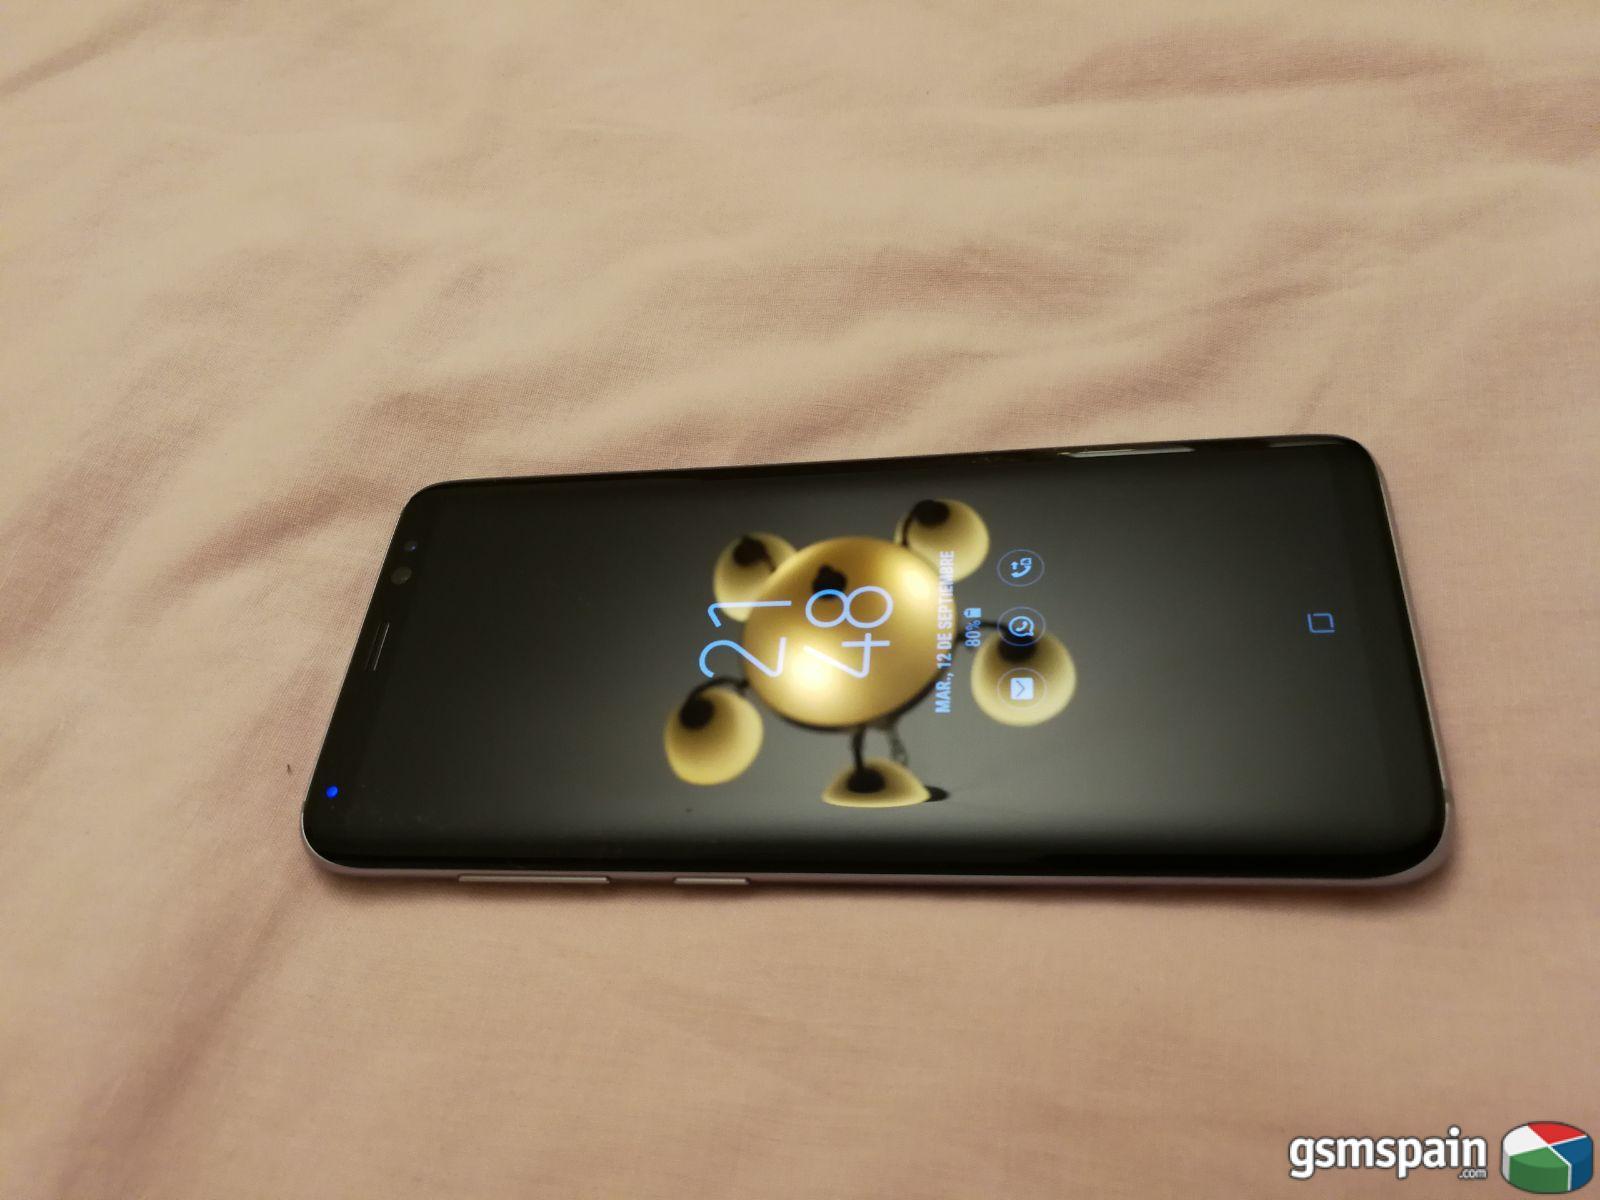 [VENDO] Samsung S8 Orchid Gray 64gb Dual SIM 480€ g.i.